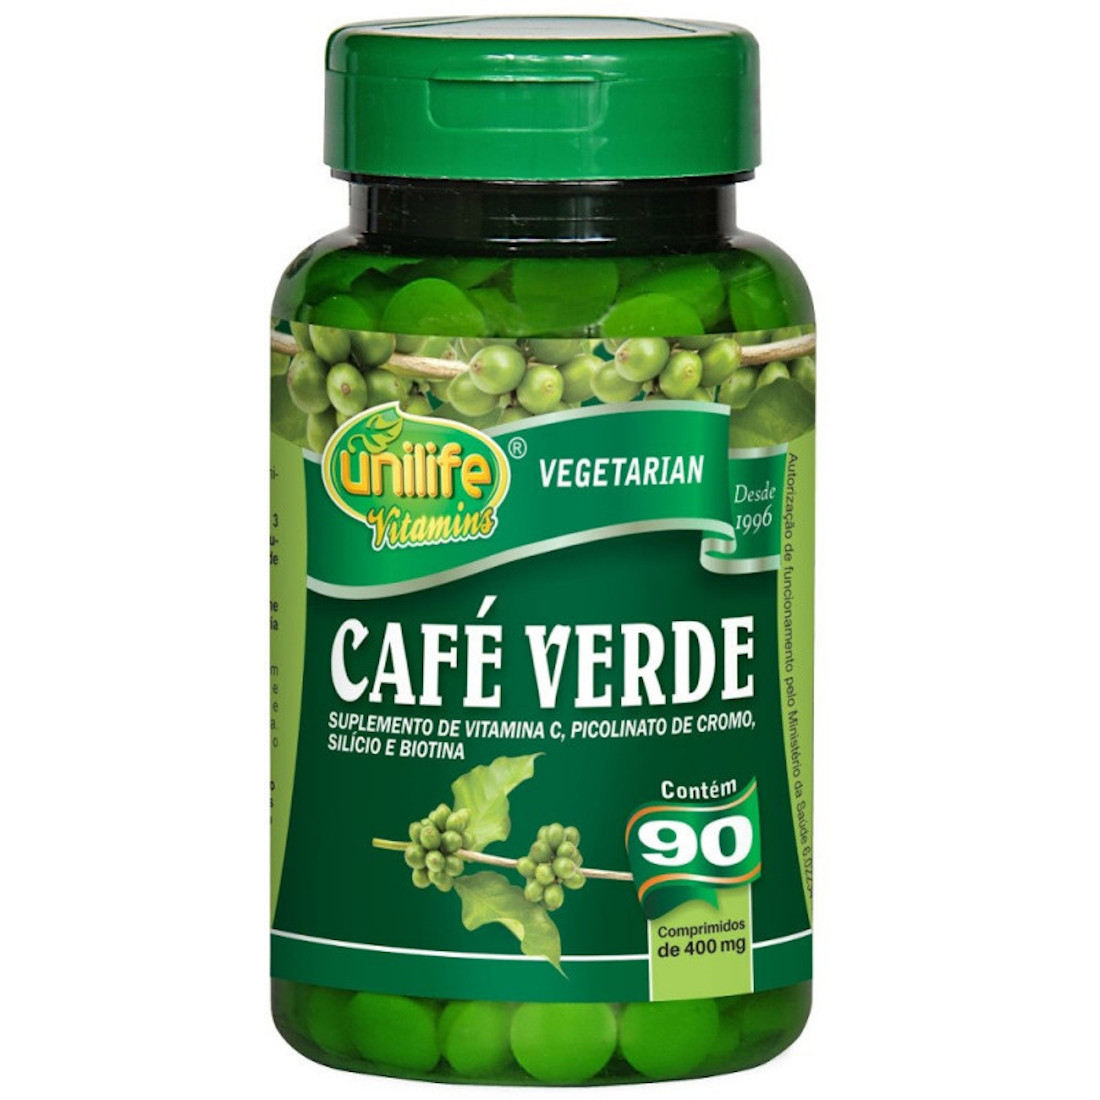 Café Verde 90 comprimidos de 400mg